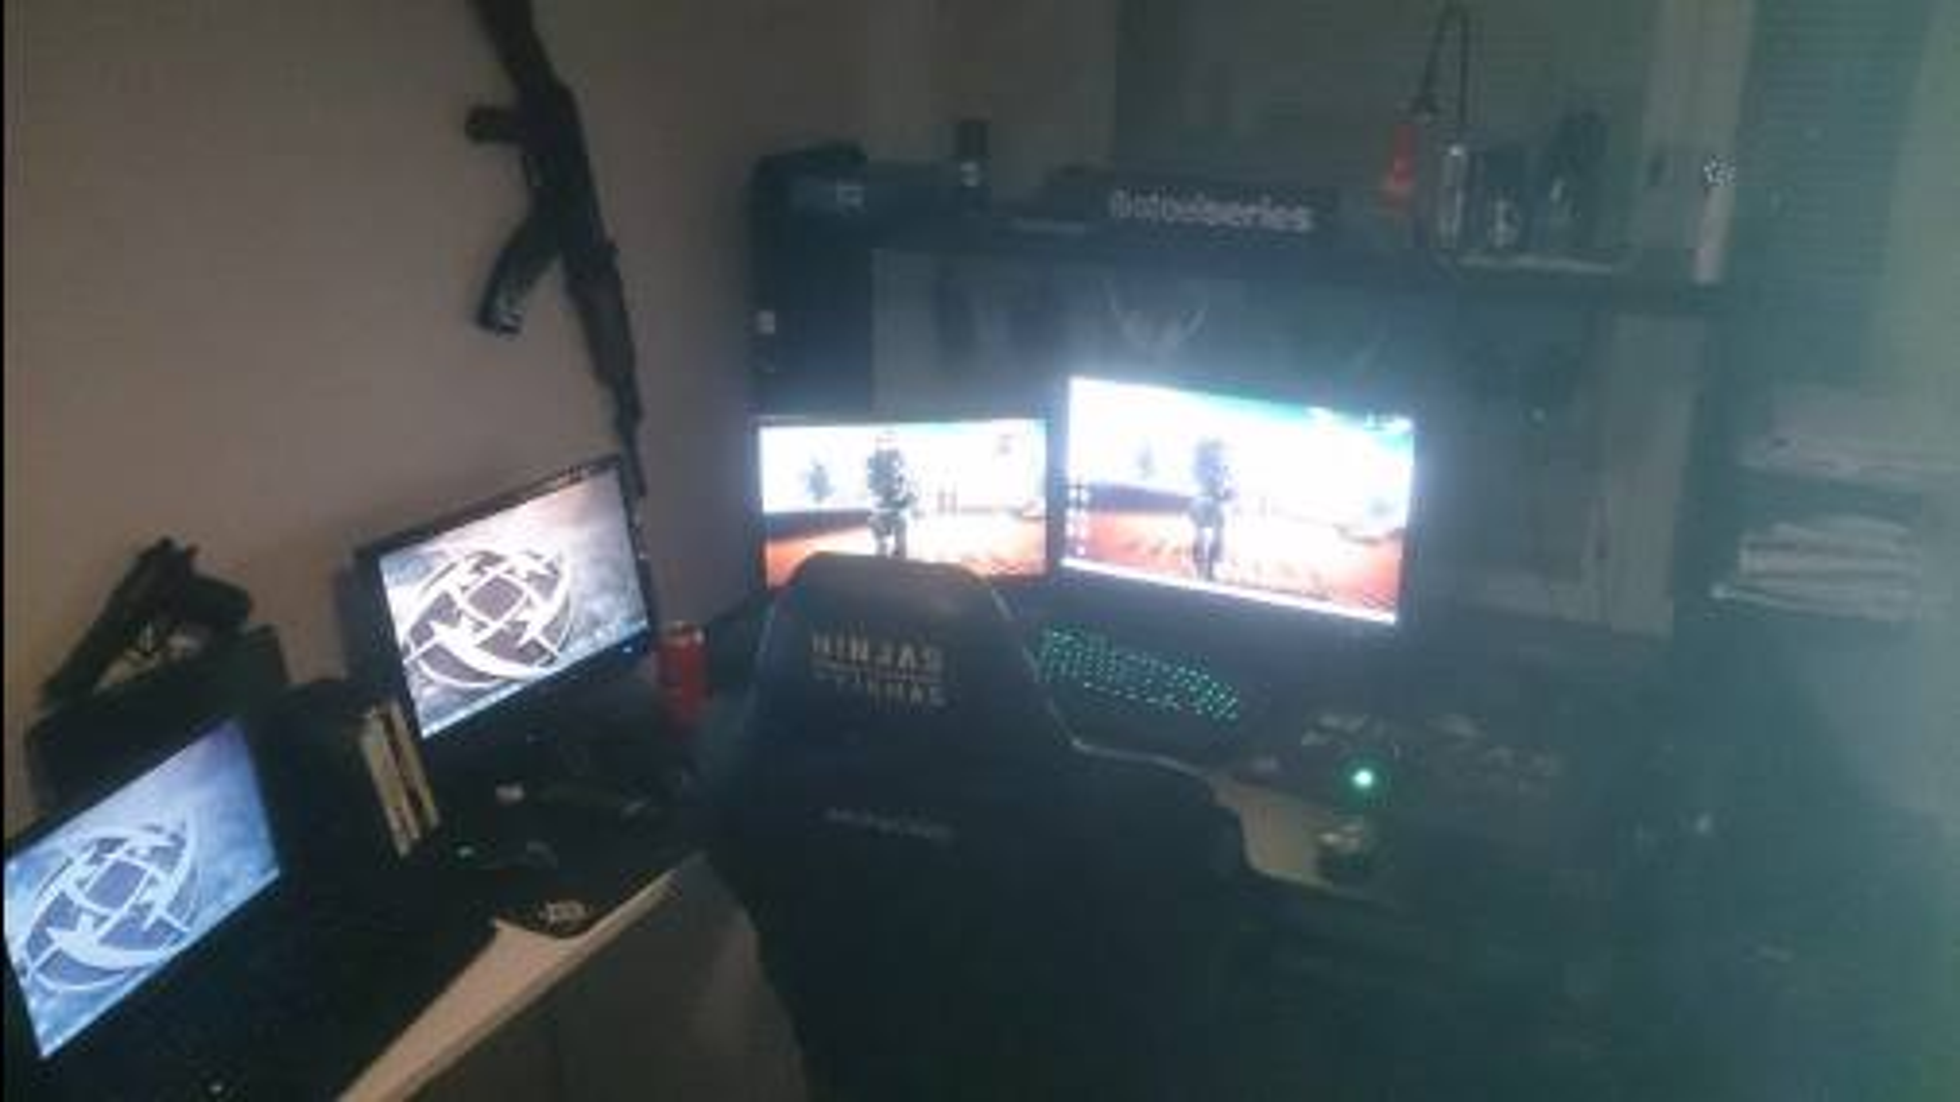 Steam Community Matsku